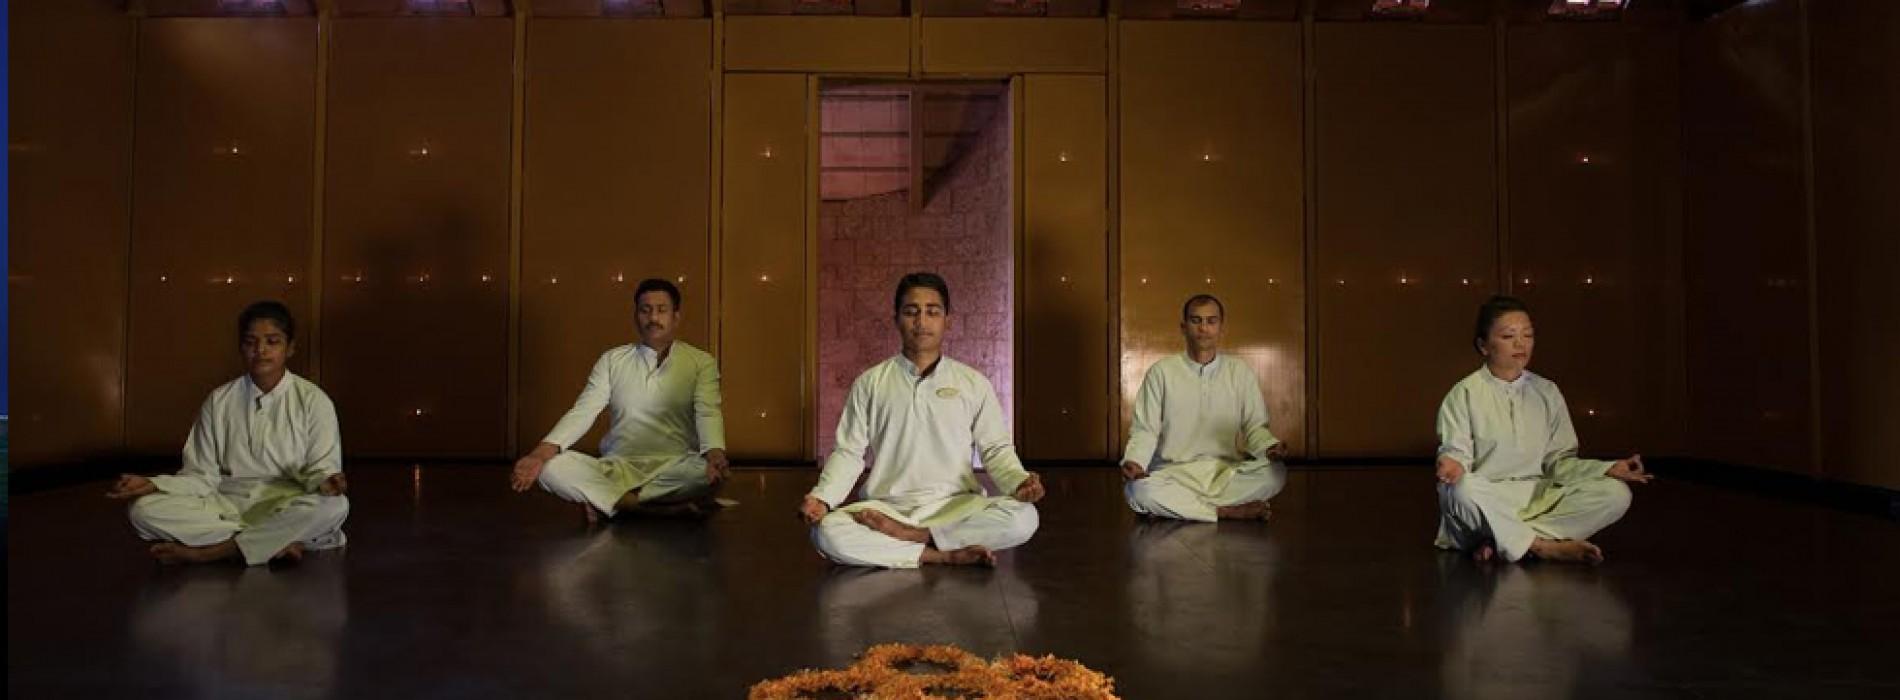 The Tamara Coorg opens doors to its spiritual haven: The 'Yoga Temple'